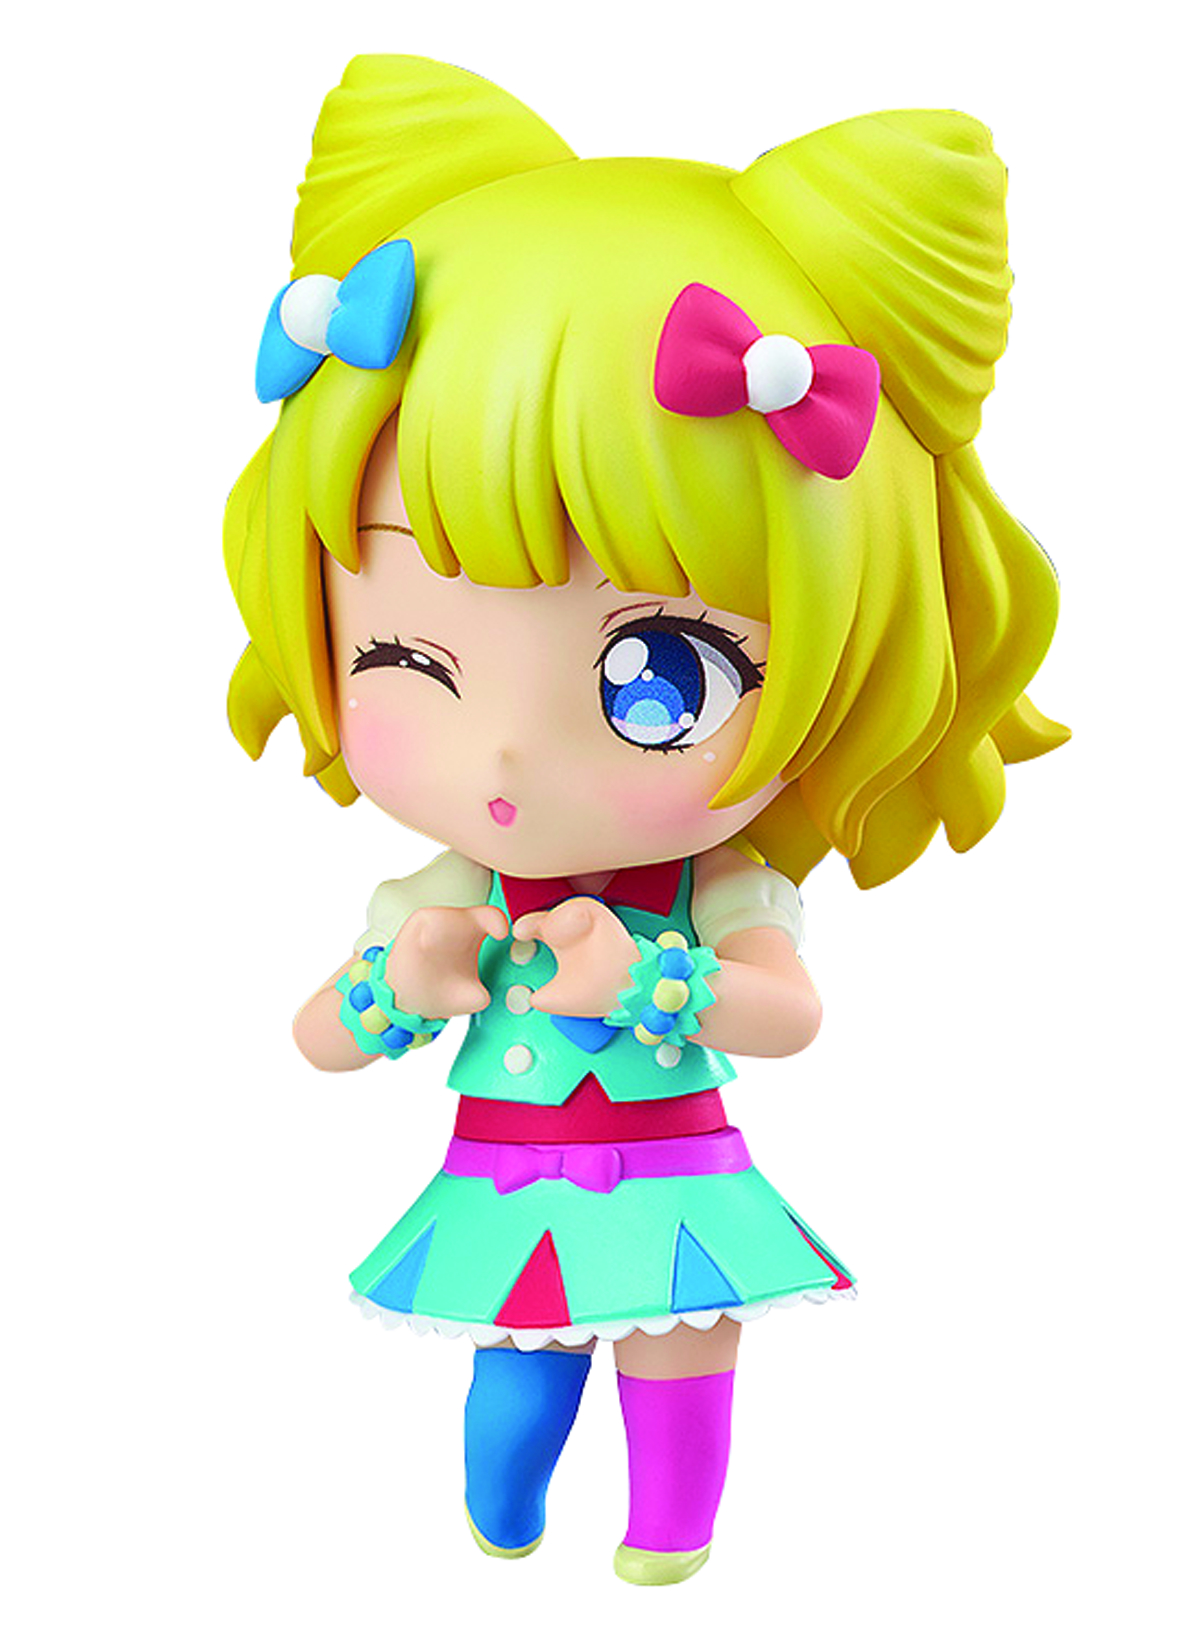 Pripara Mirei Minami Candy Alamode Nendoroid